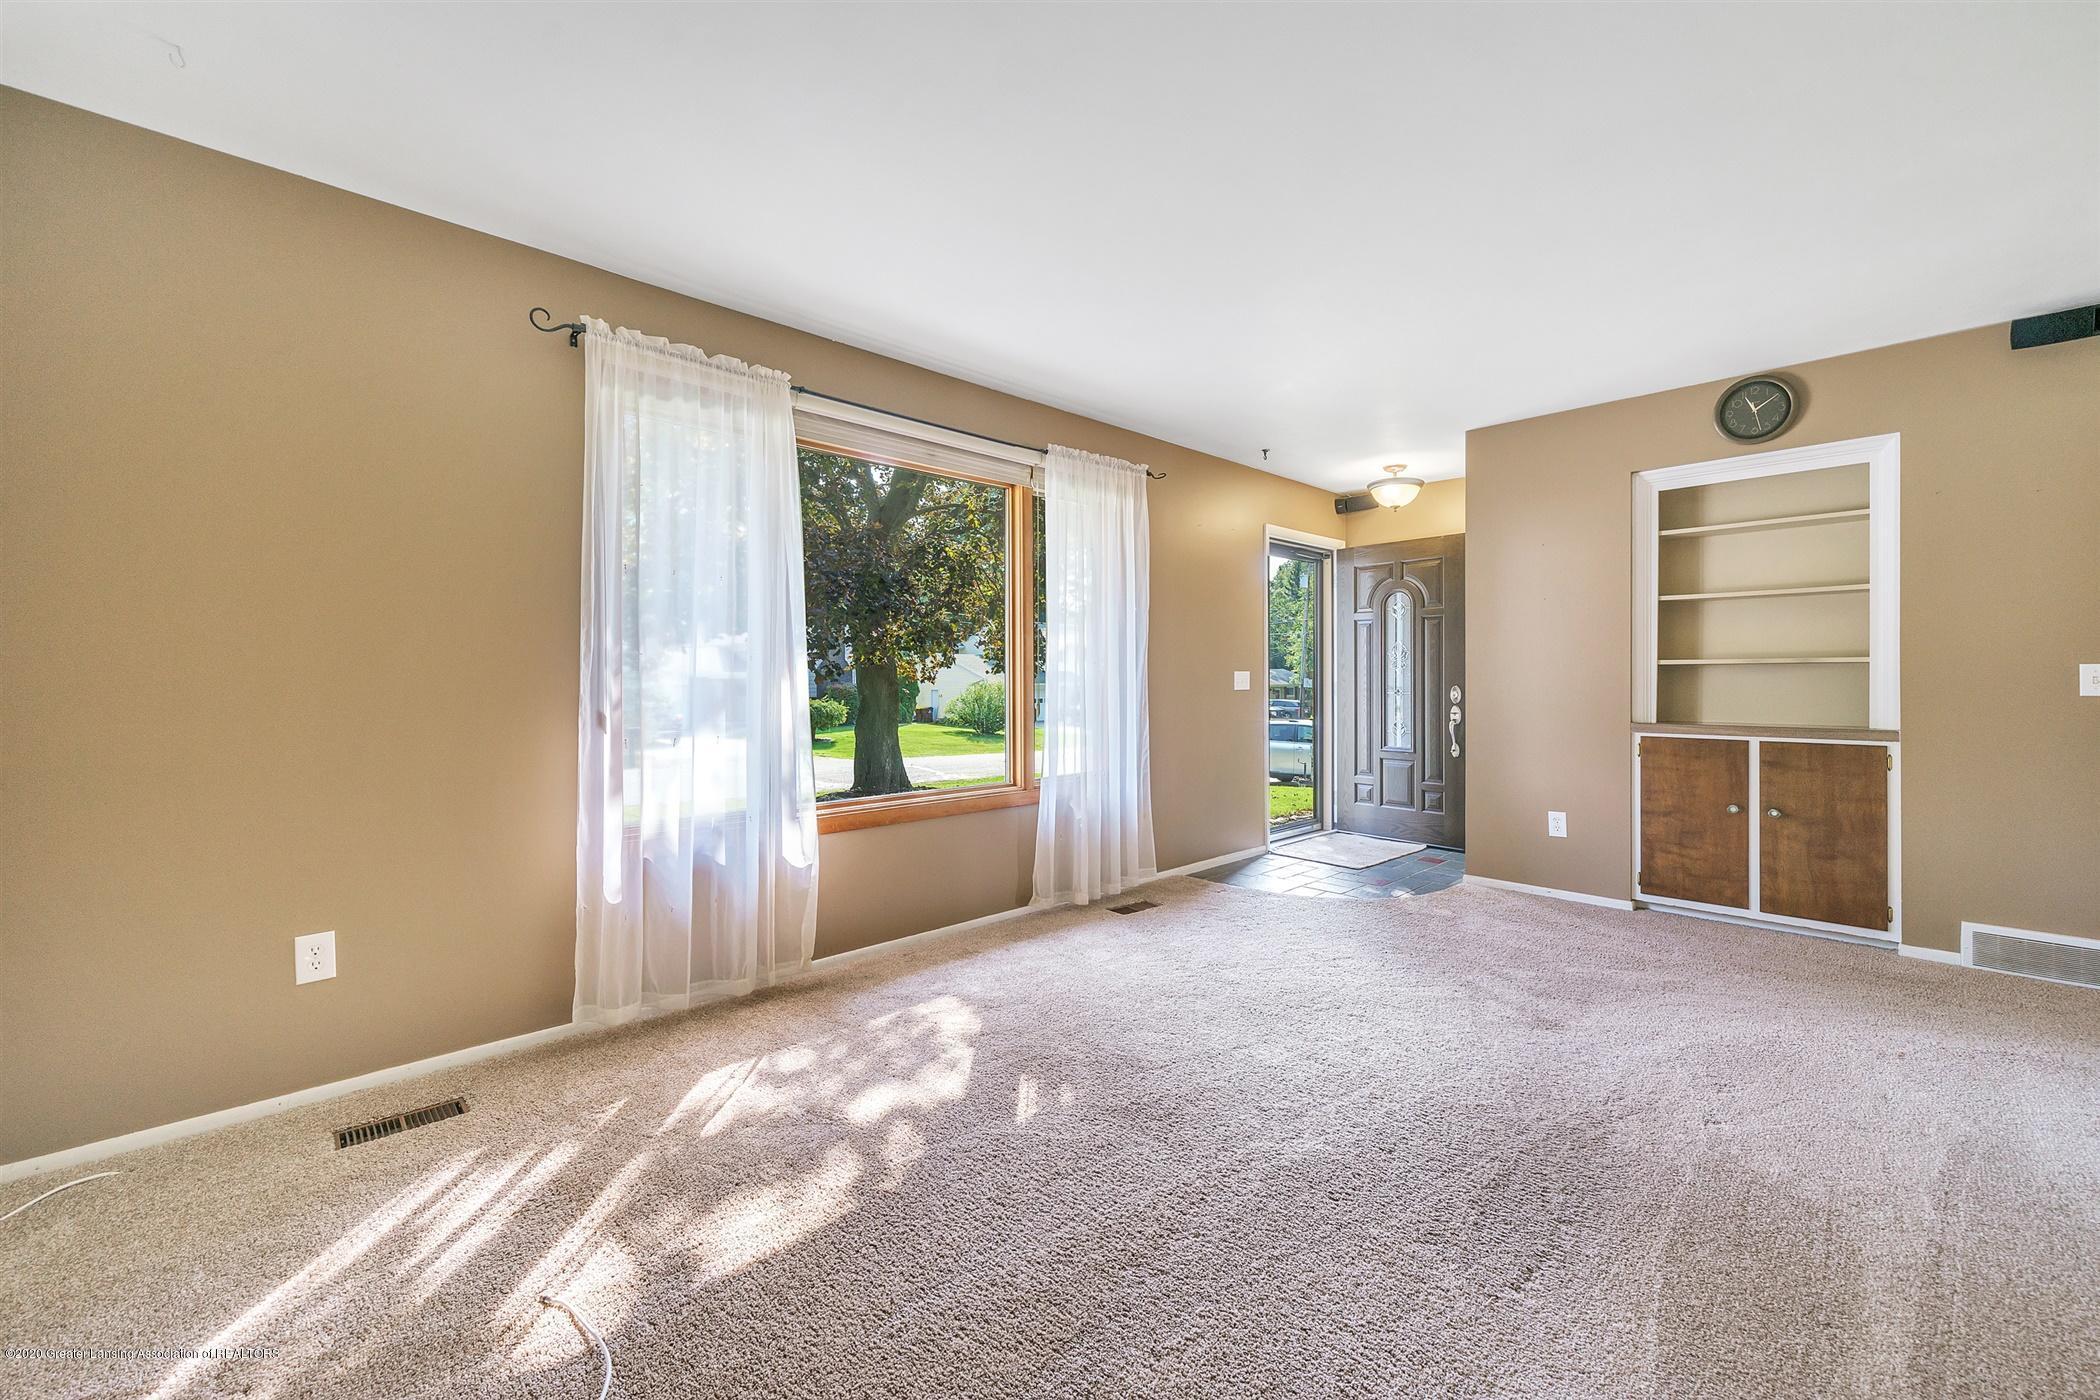 4557 Seneca Dr - (4) MAIN FLOOR Living Room - 4